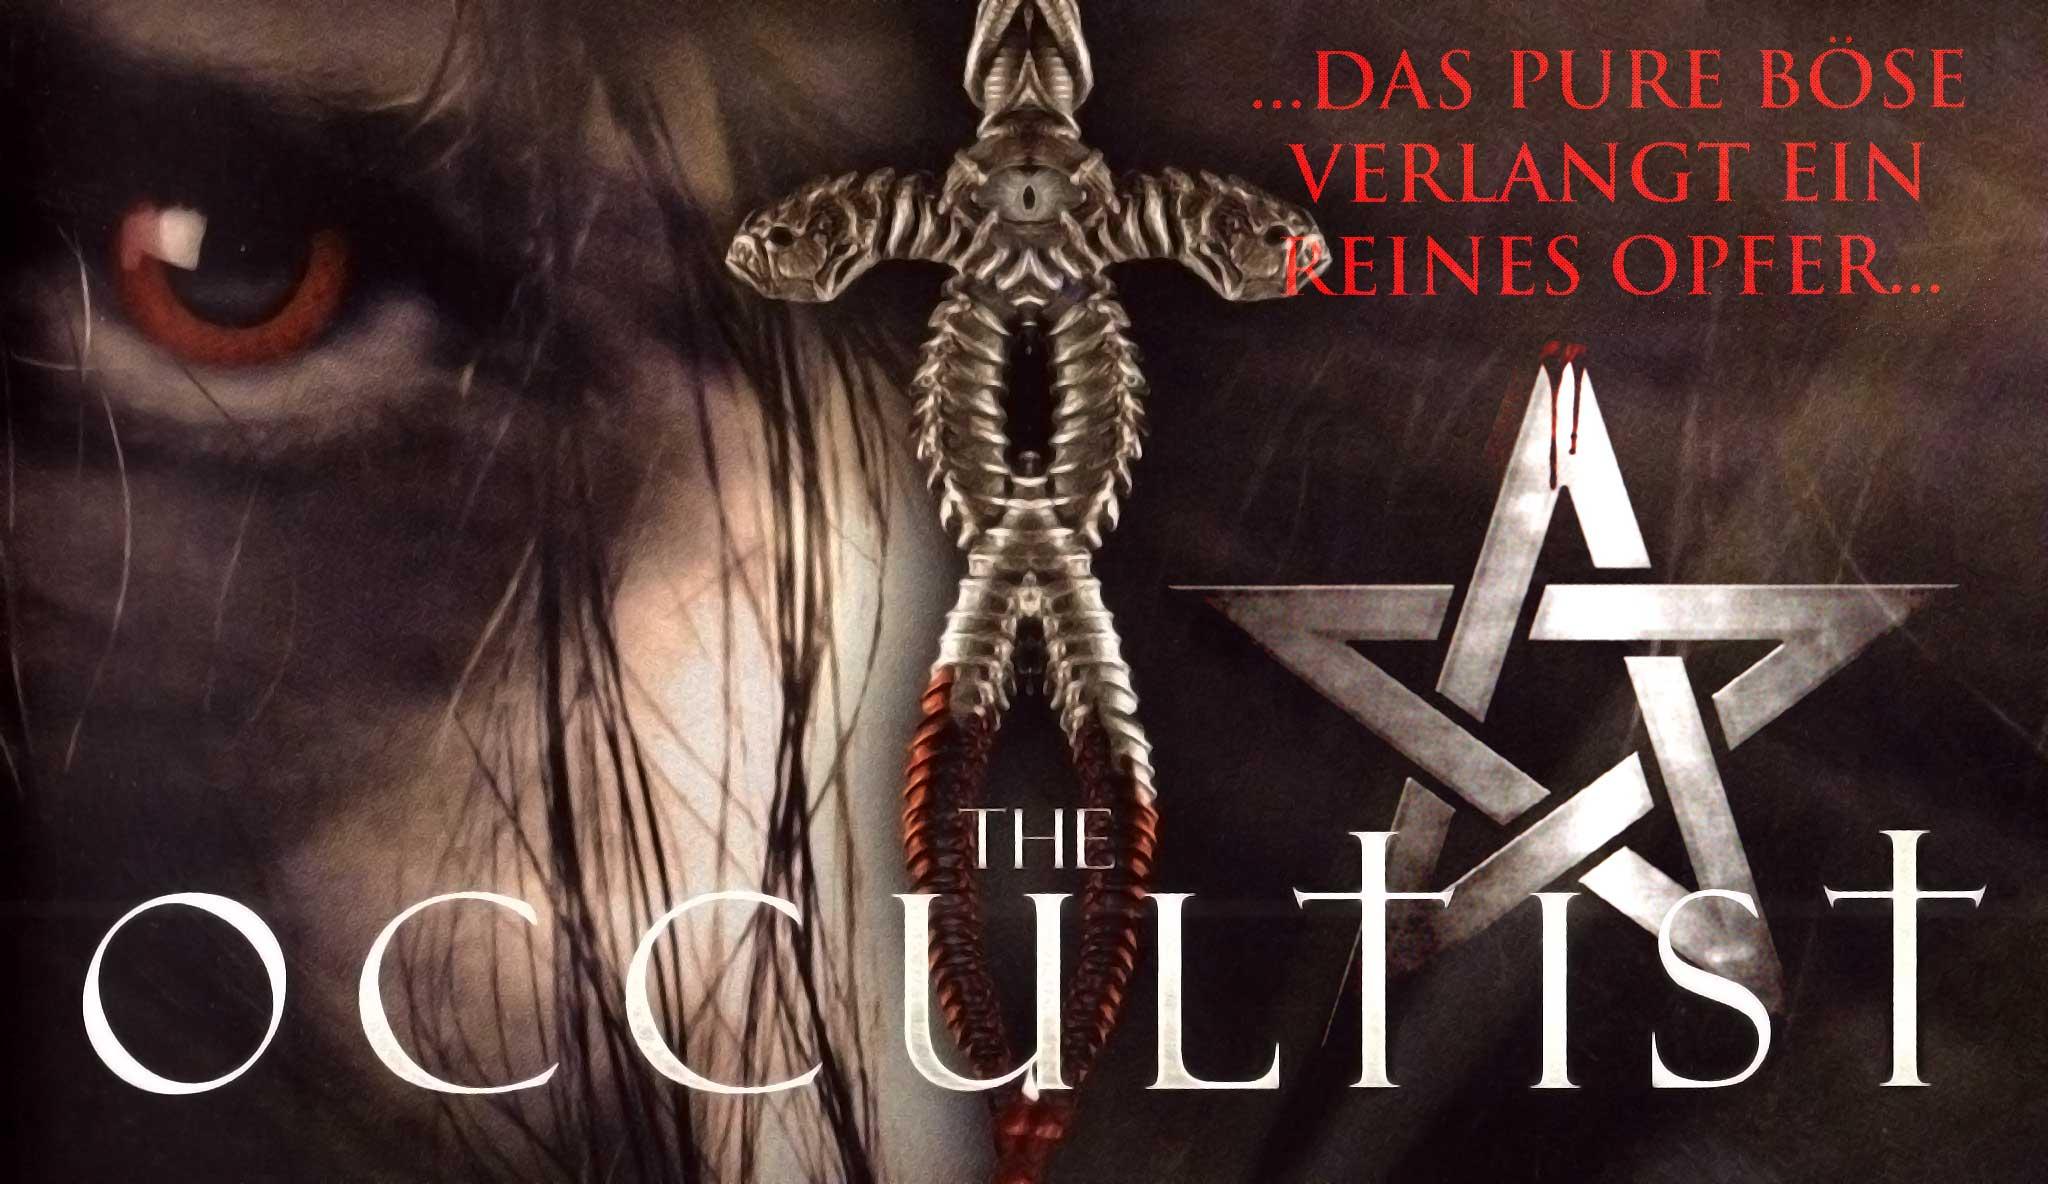 the-occultist\header.jpg